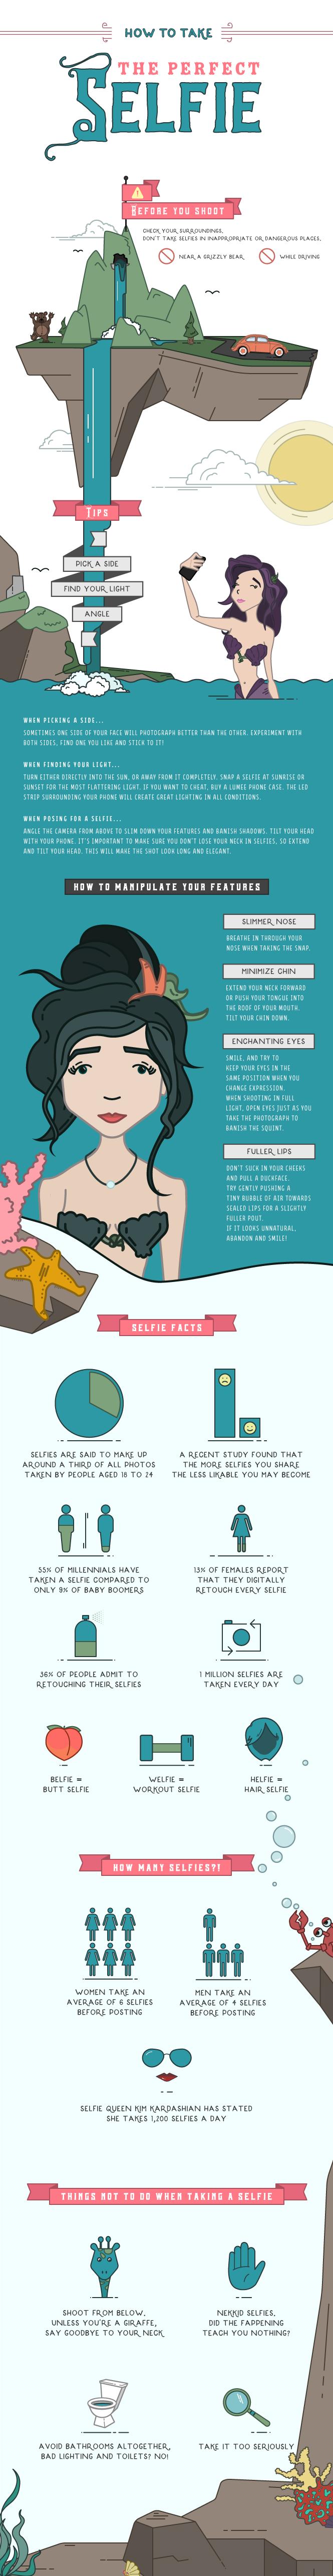 Selfie Infographic.jpg